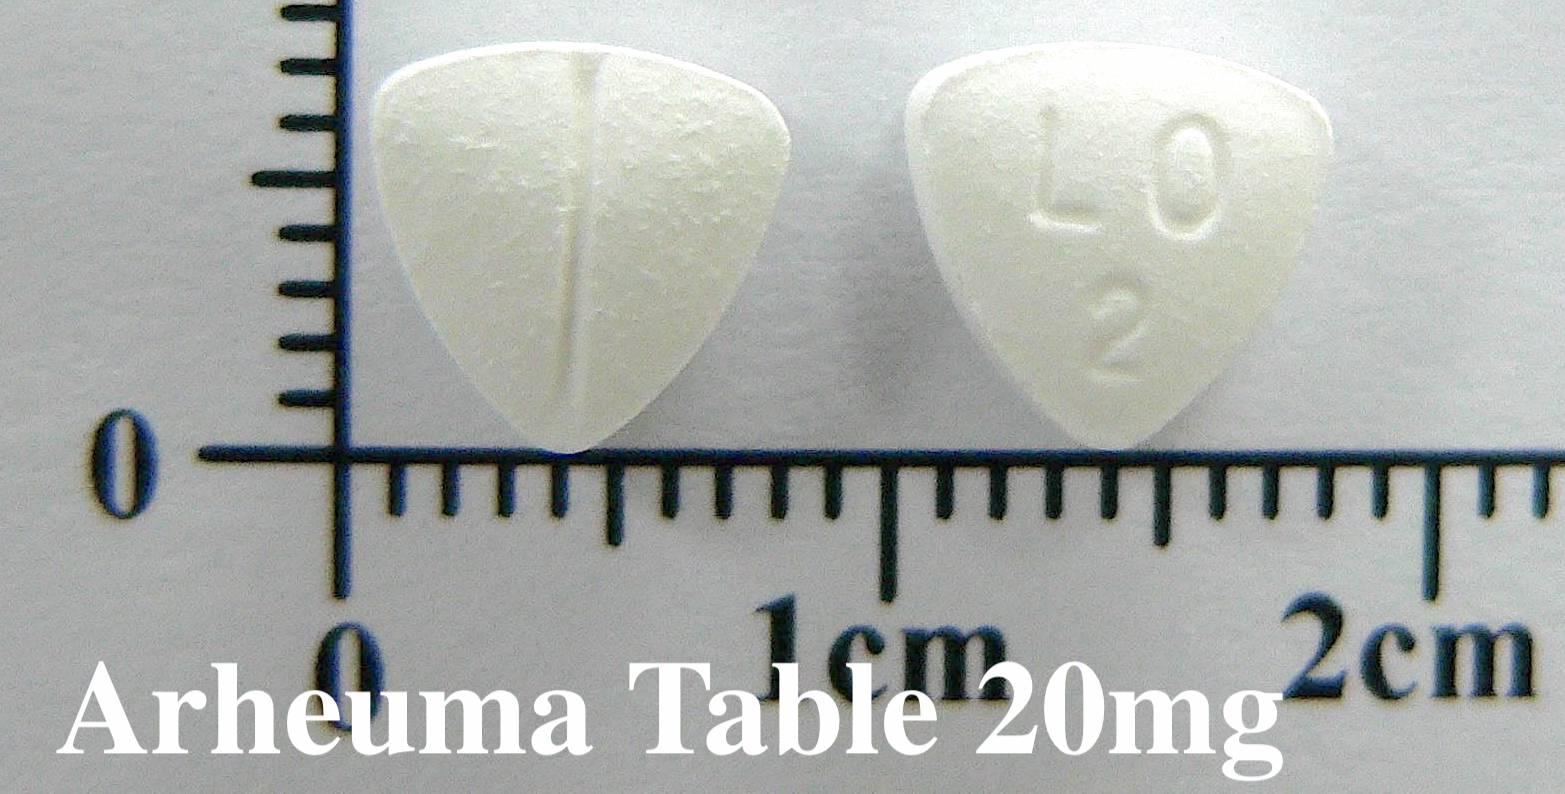 LOTUS ARHEUMA TABLETS 20MG 藥品回收:雅努麻錠(ARHEUMA TABLETS)關節炎症用藥(2018.03)